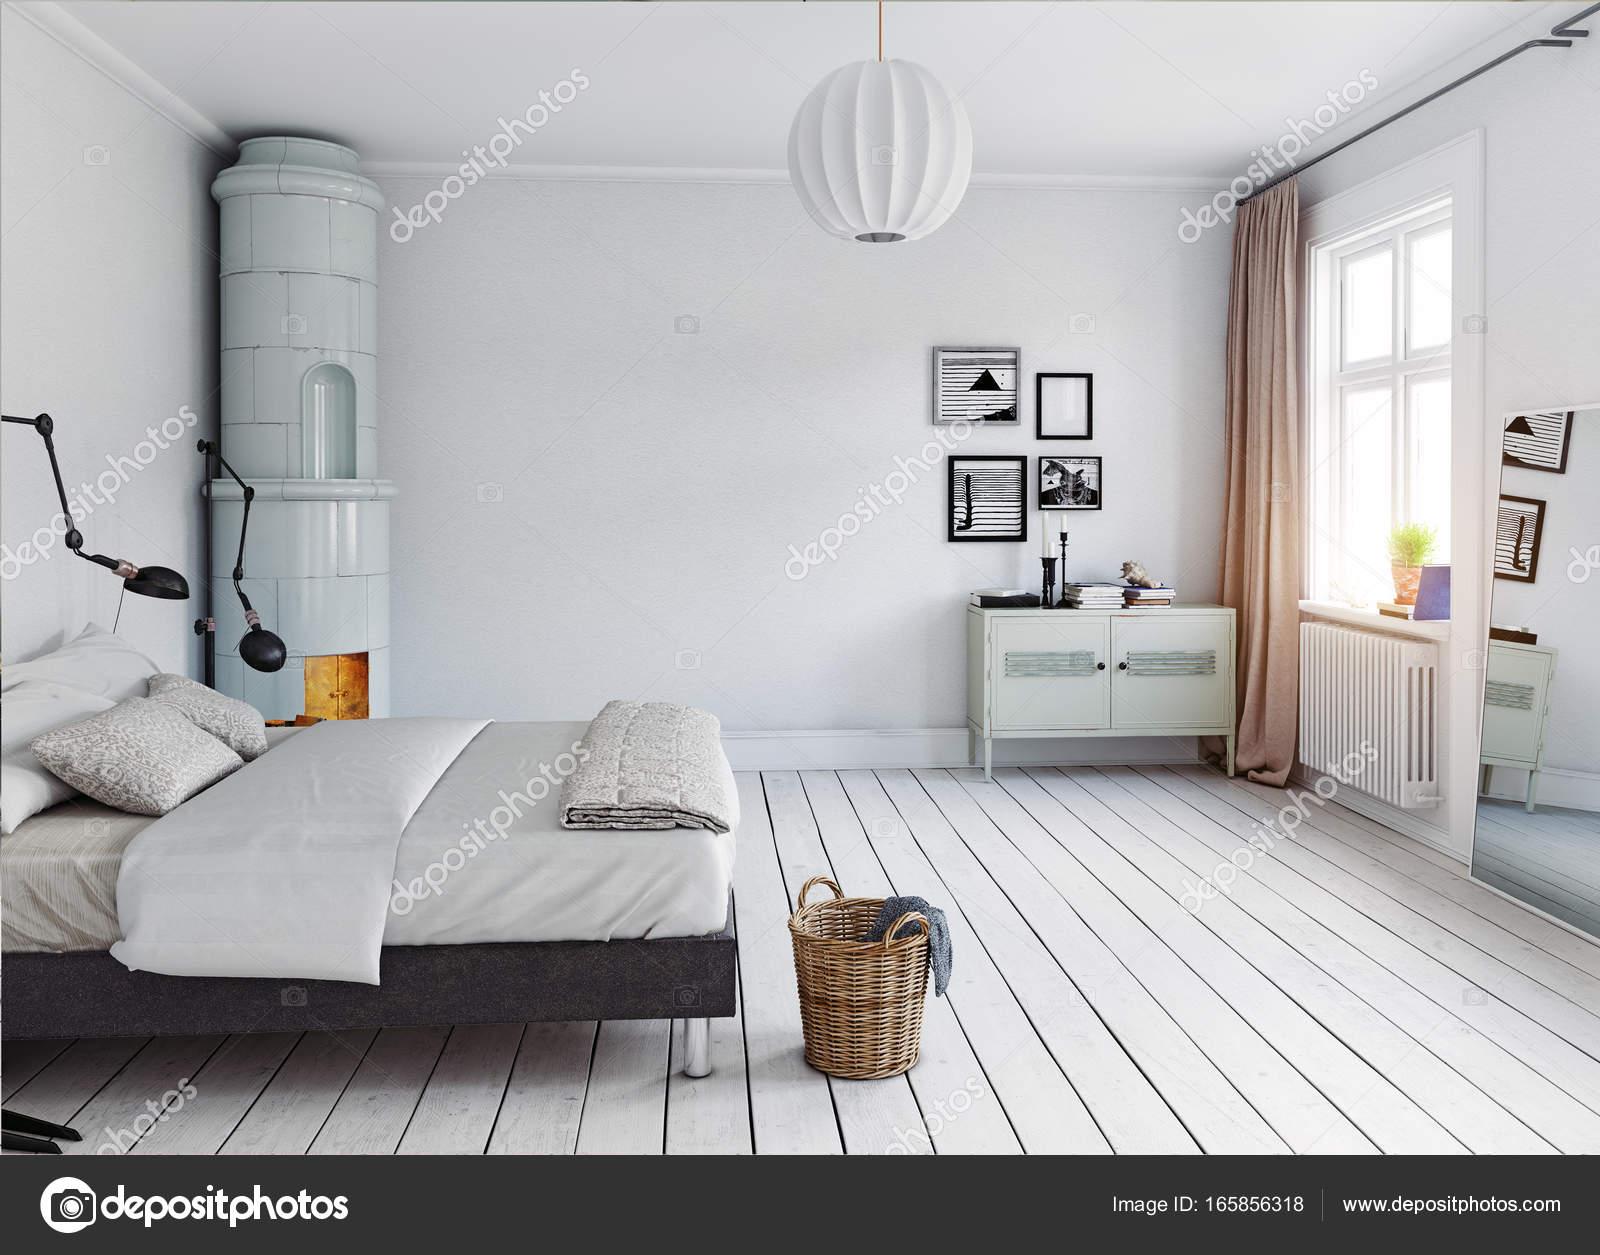 moderne slaapkamer interieur — Stockfoto © vicnt2815 #165856318